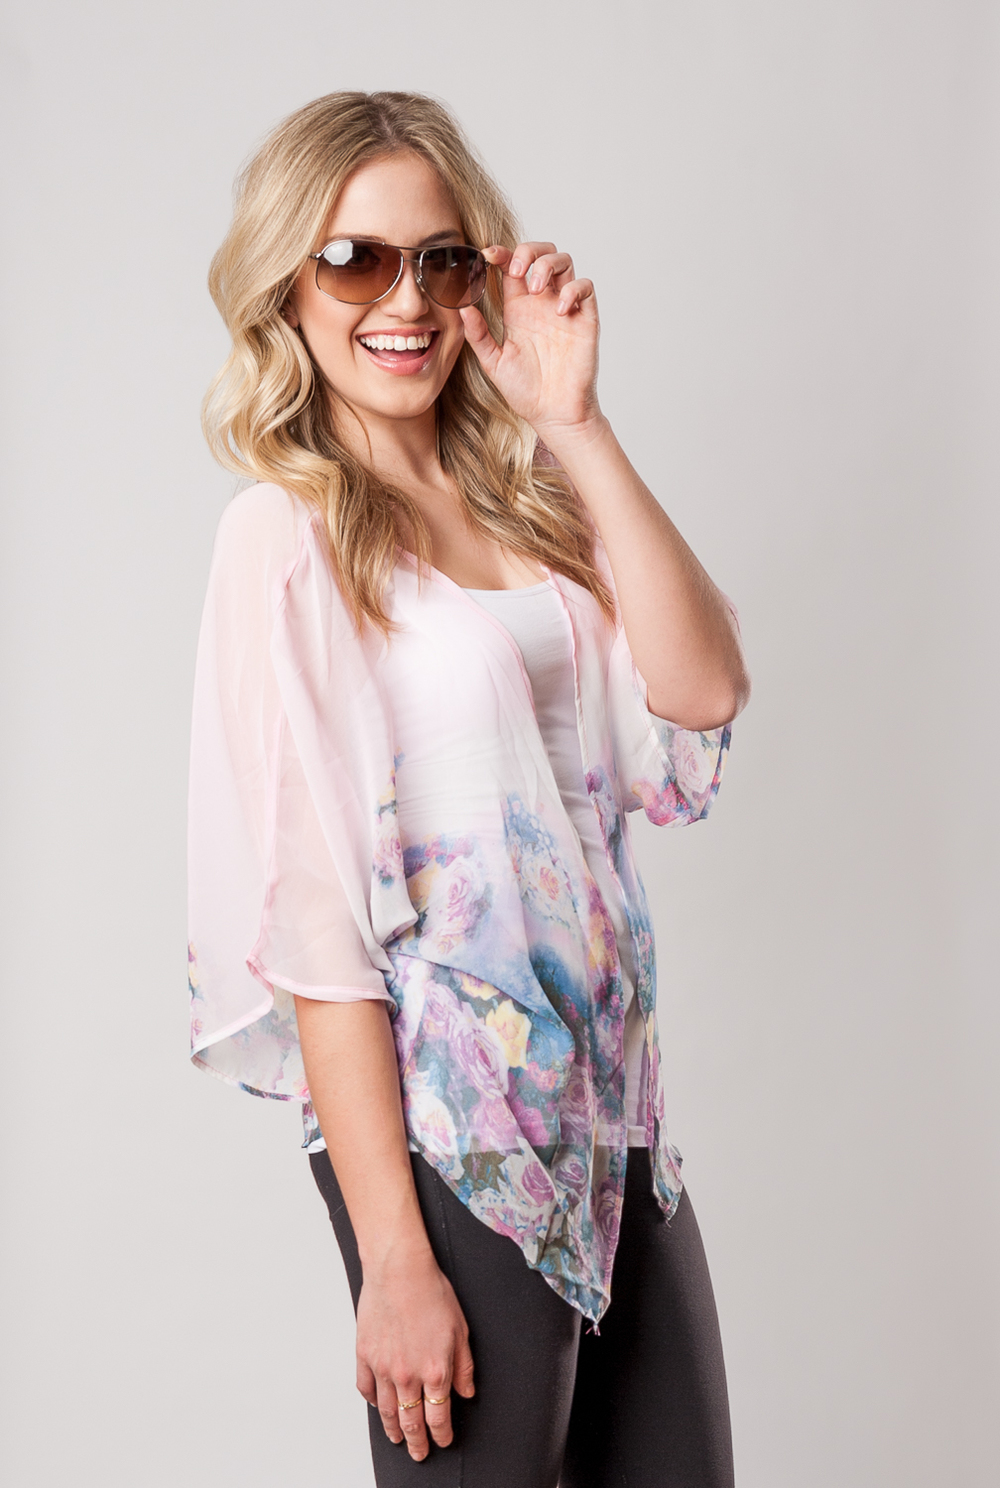 Hamilton Toronto Niagara Fashion Photographee - Sassy Gal Spring Clothing Line - Photography by Marek Michalek 005.jpg